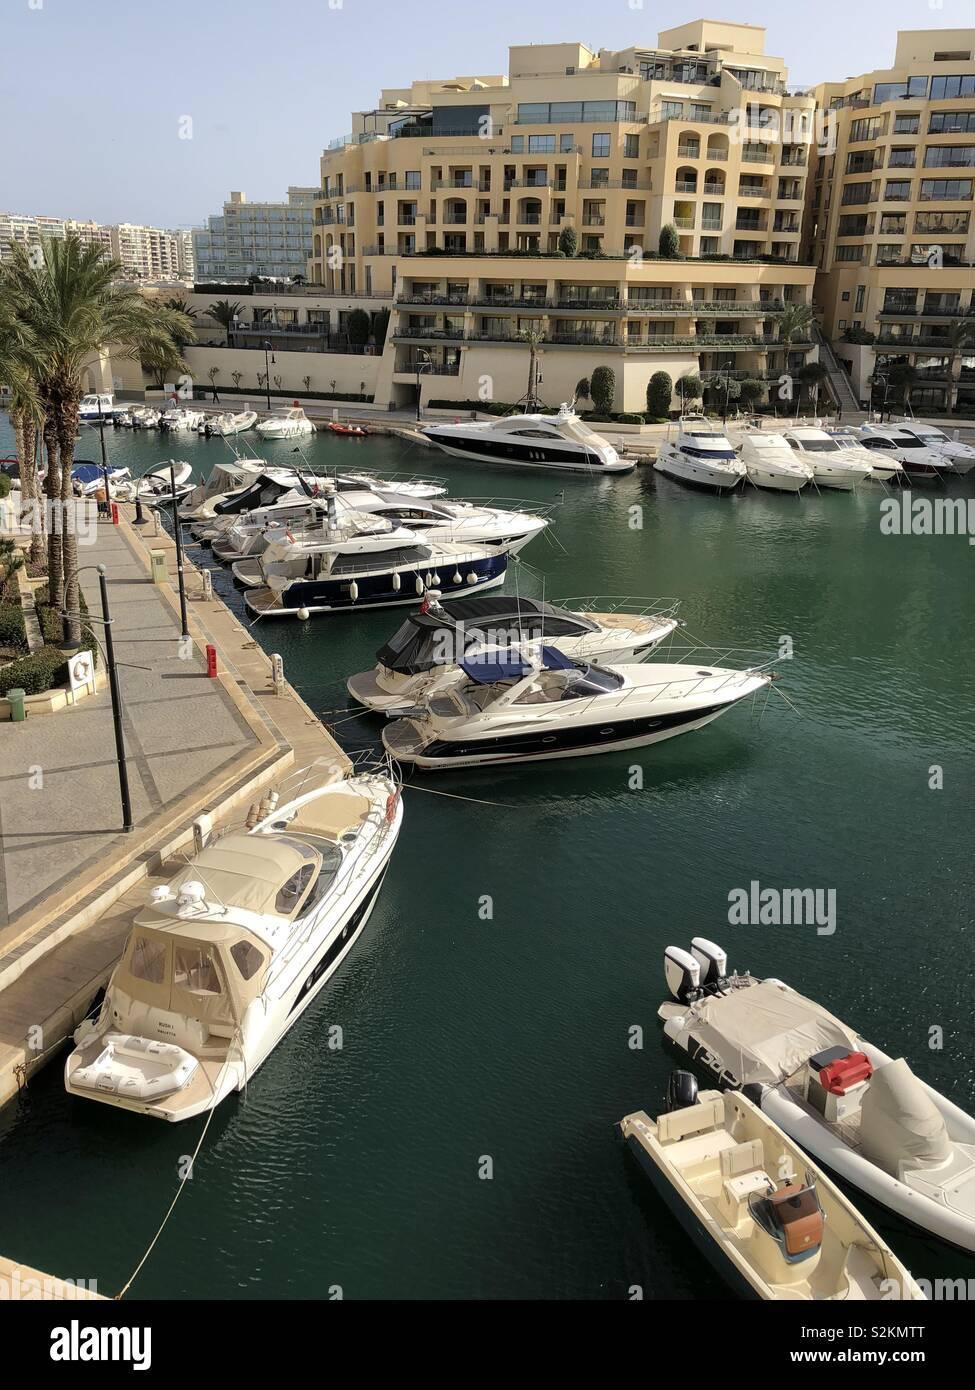 High end luxury lifestyle living marina yachts apartments Malta Stock Photo